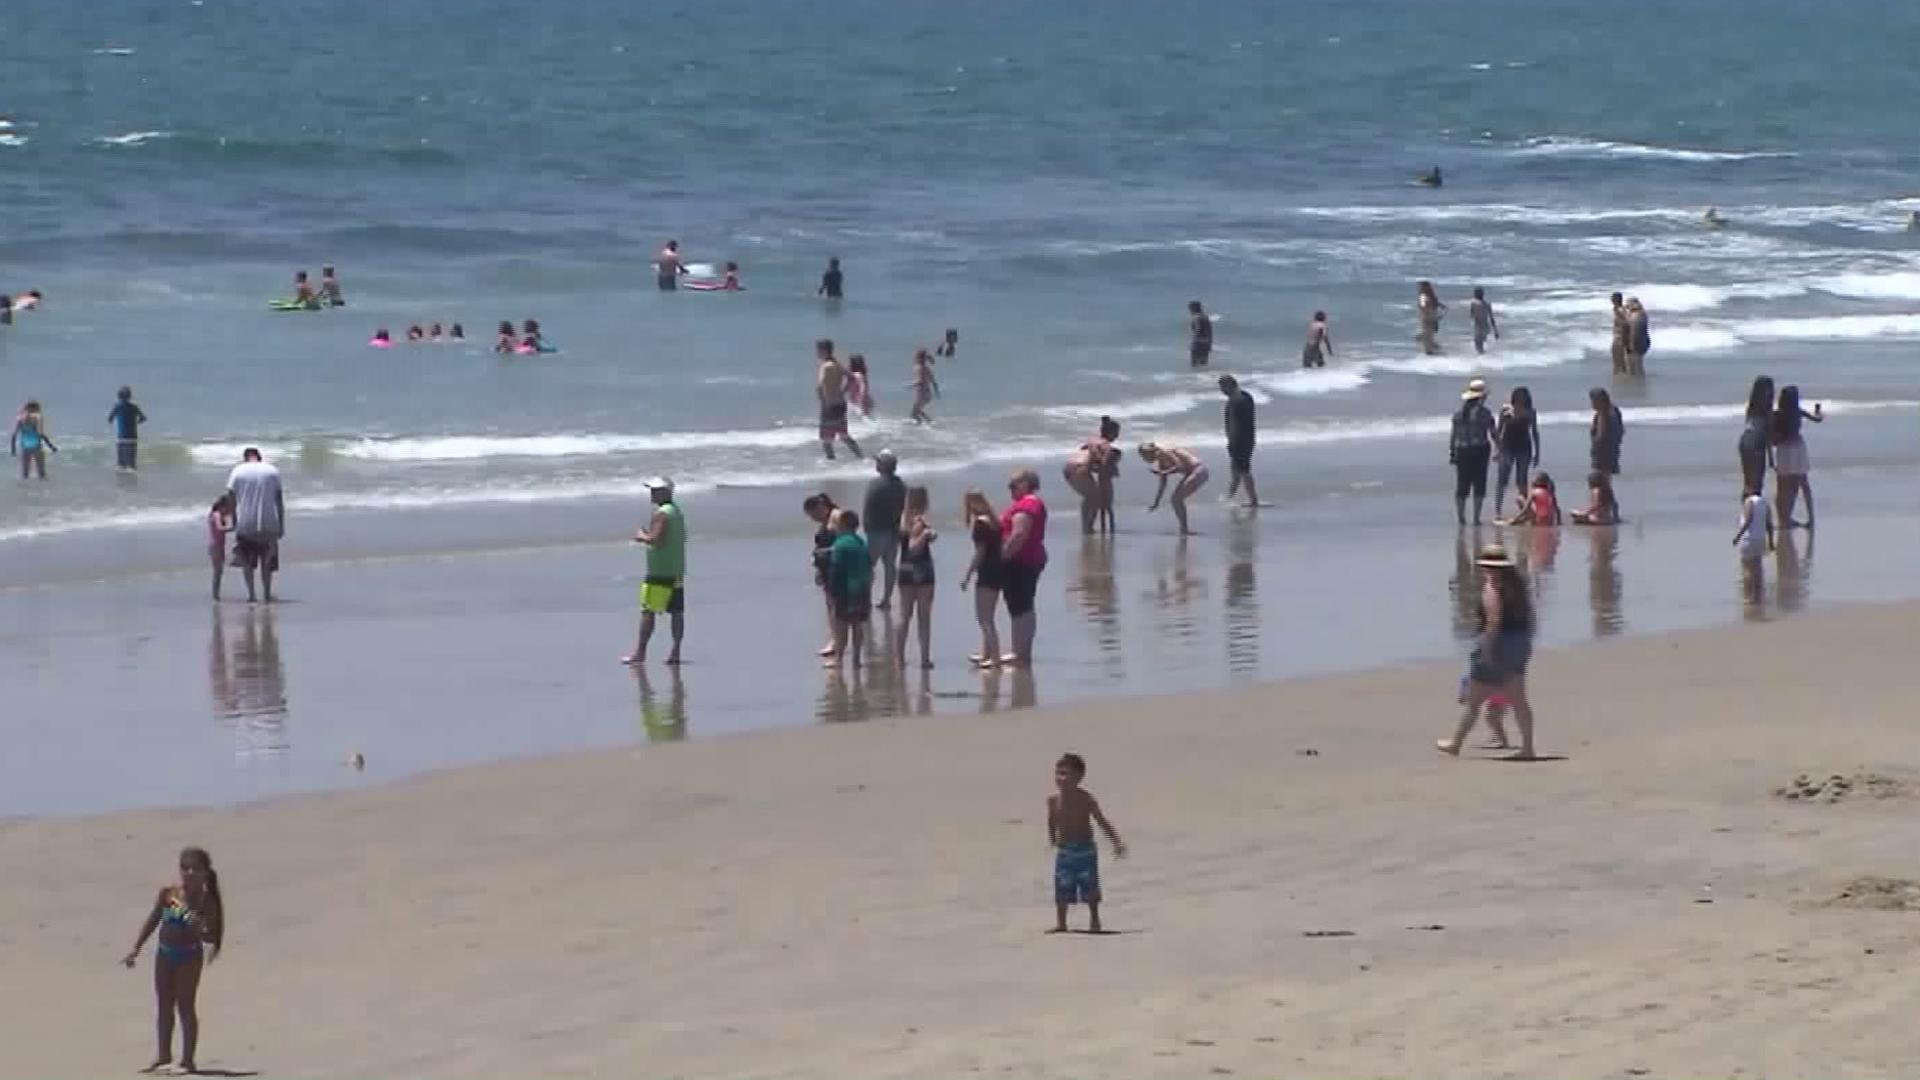 Beachgoers escape the heat wave in Newport Beach on June 17, 2016. (Credit: KTLA)